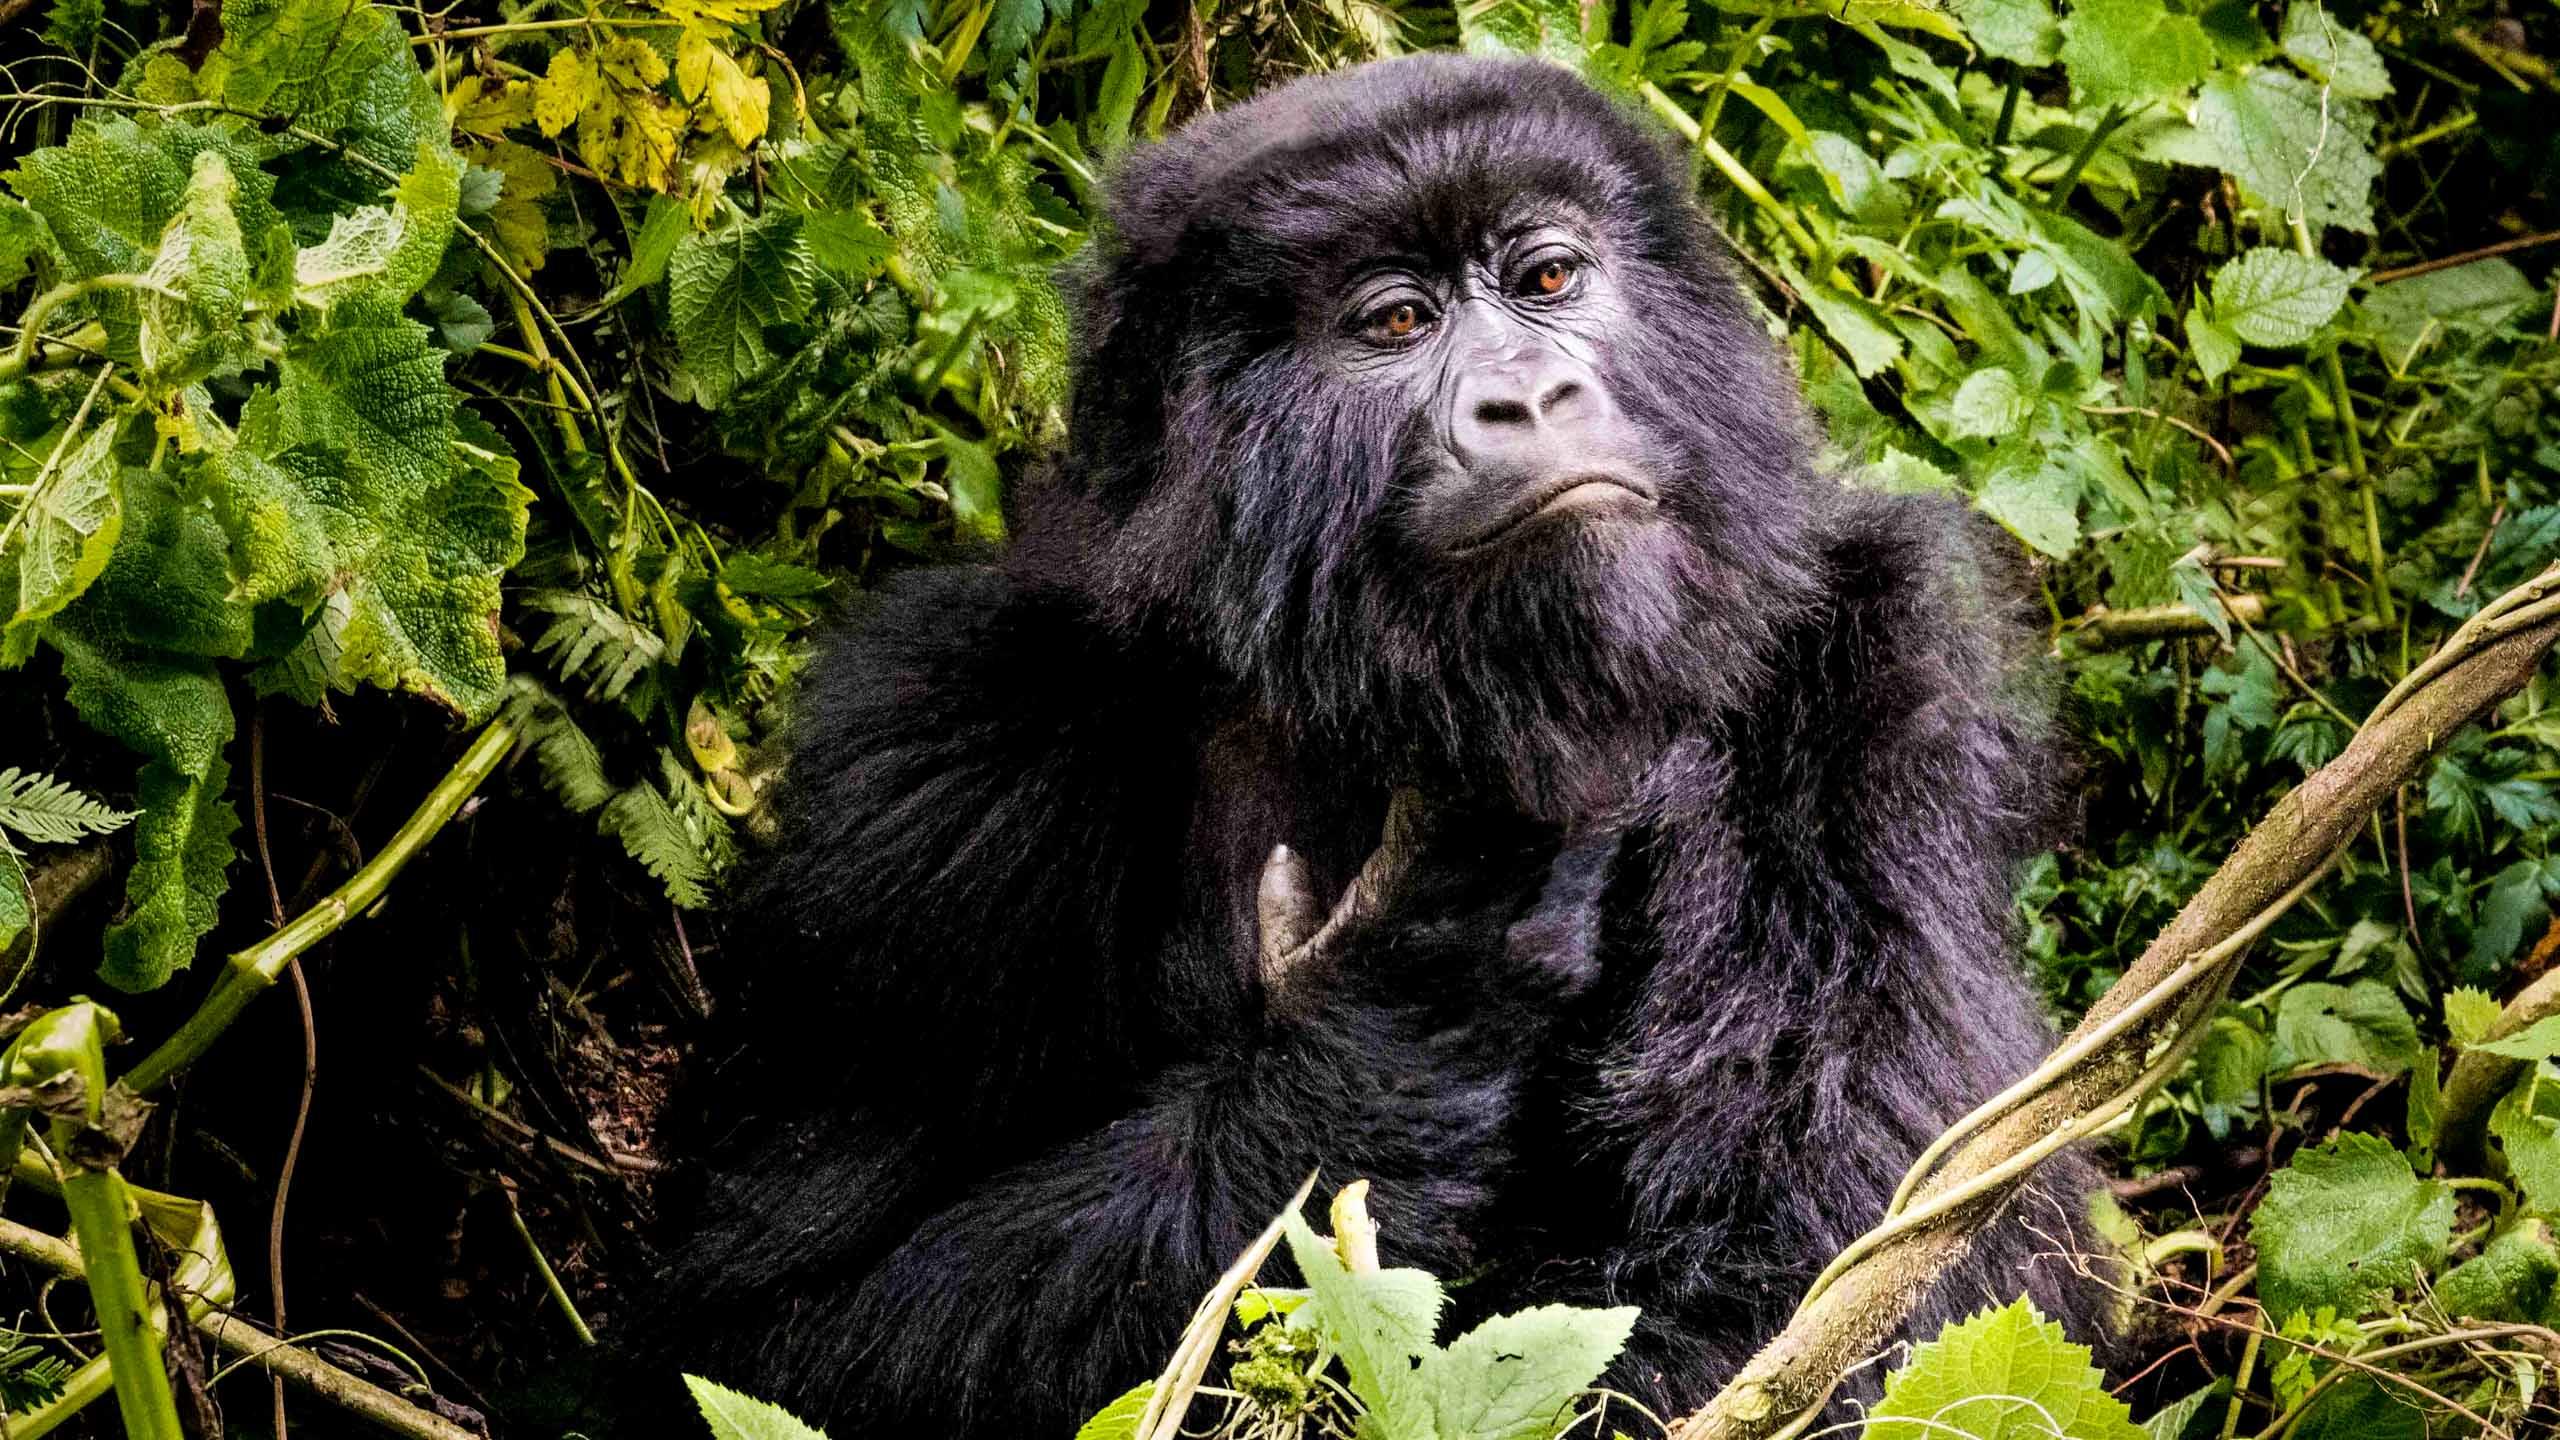 Gorilla in Uganda forest